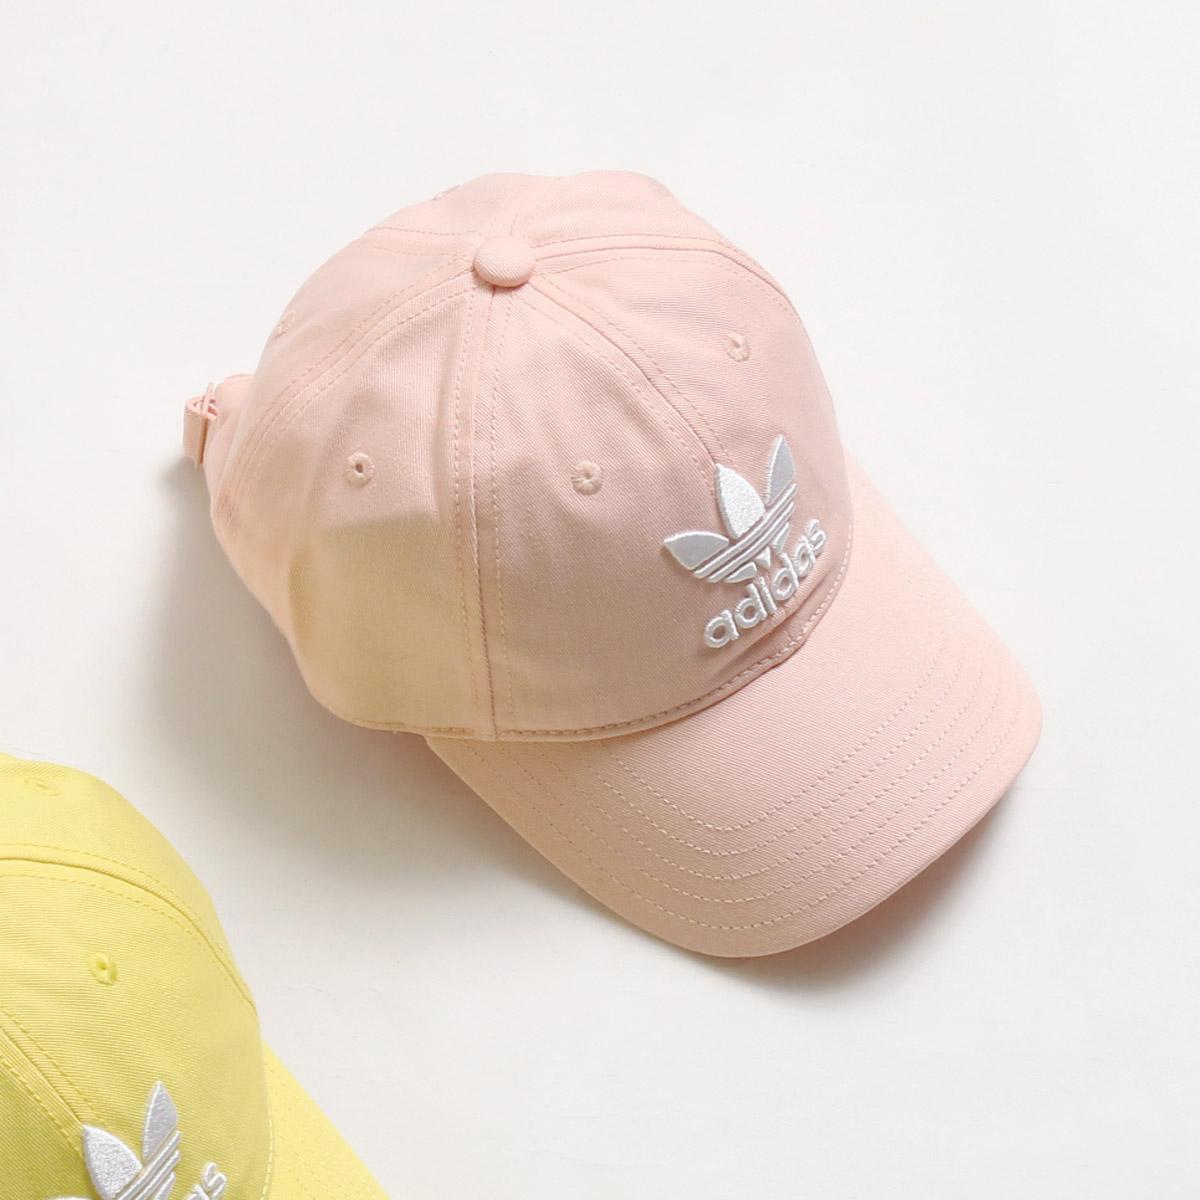 65674c9b38d069 adidas Originals TREFOIL CAP (アディダス オリジナルス トレフォイル キャップ) Blush/Pink/White  【帽子】